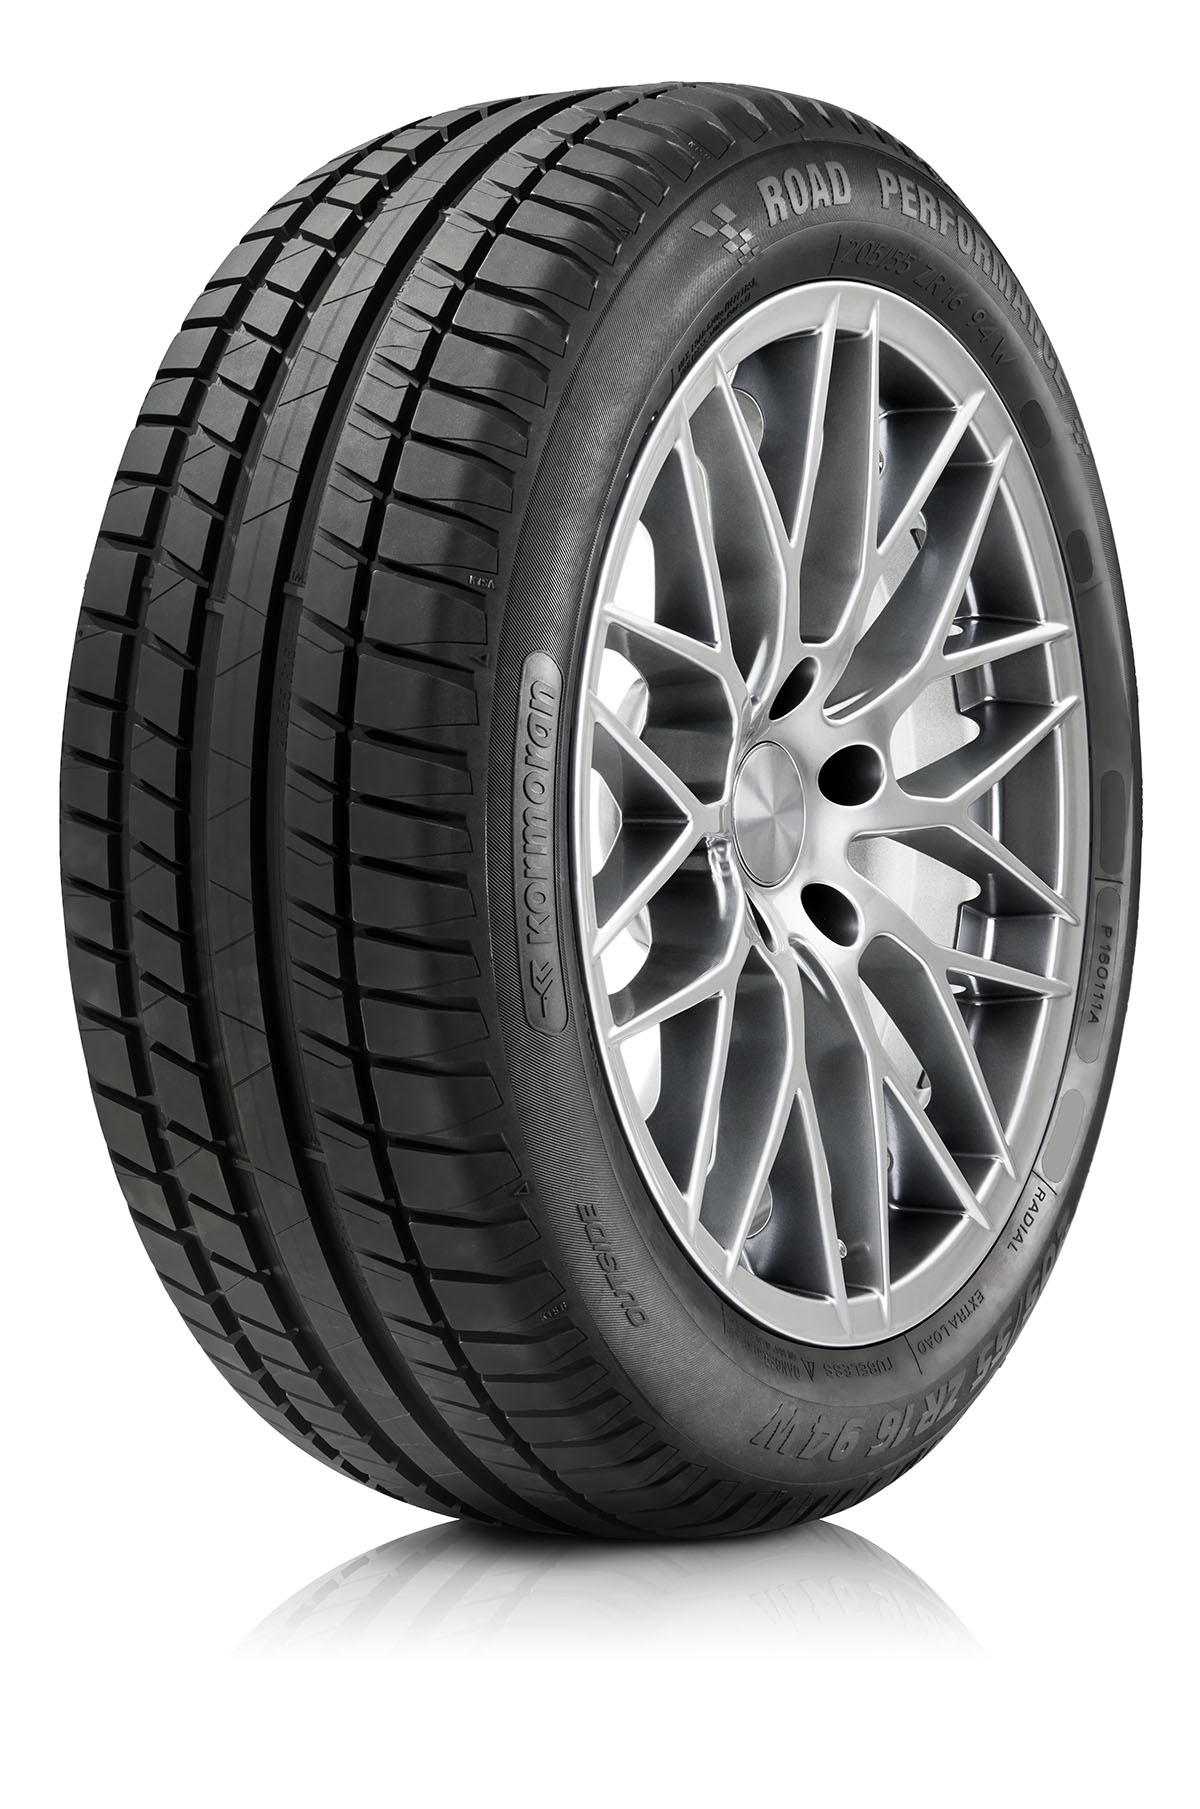 kormoran-road-performance-165-65r1581h